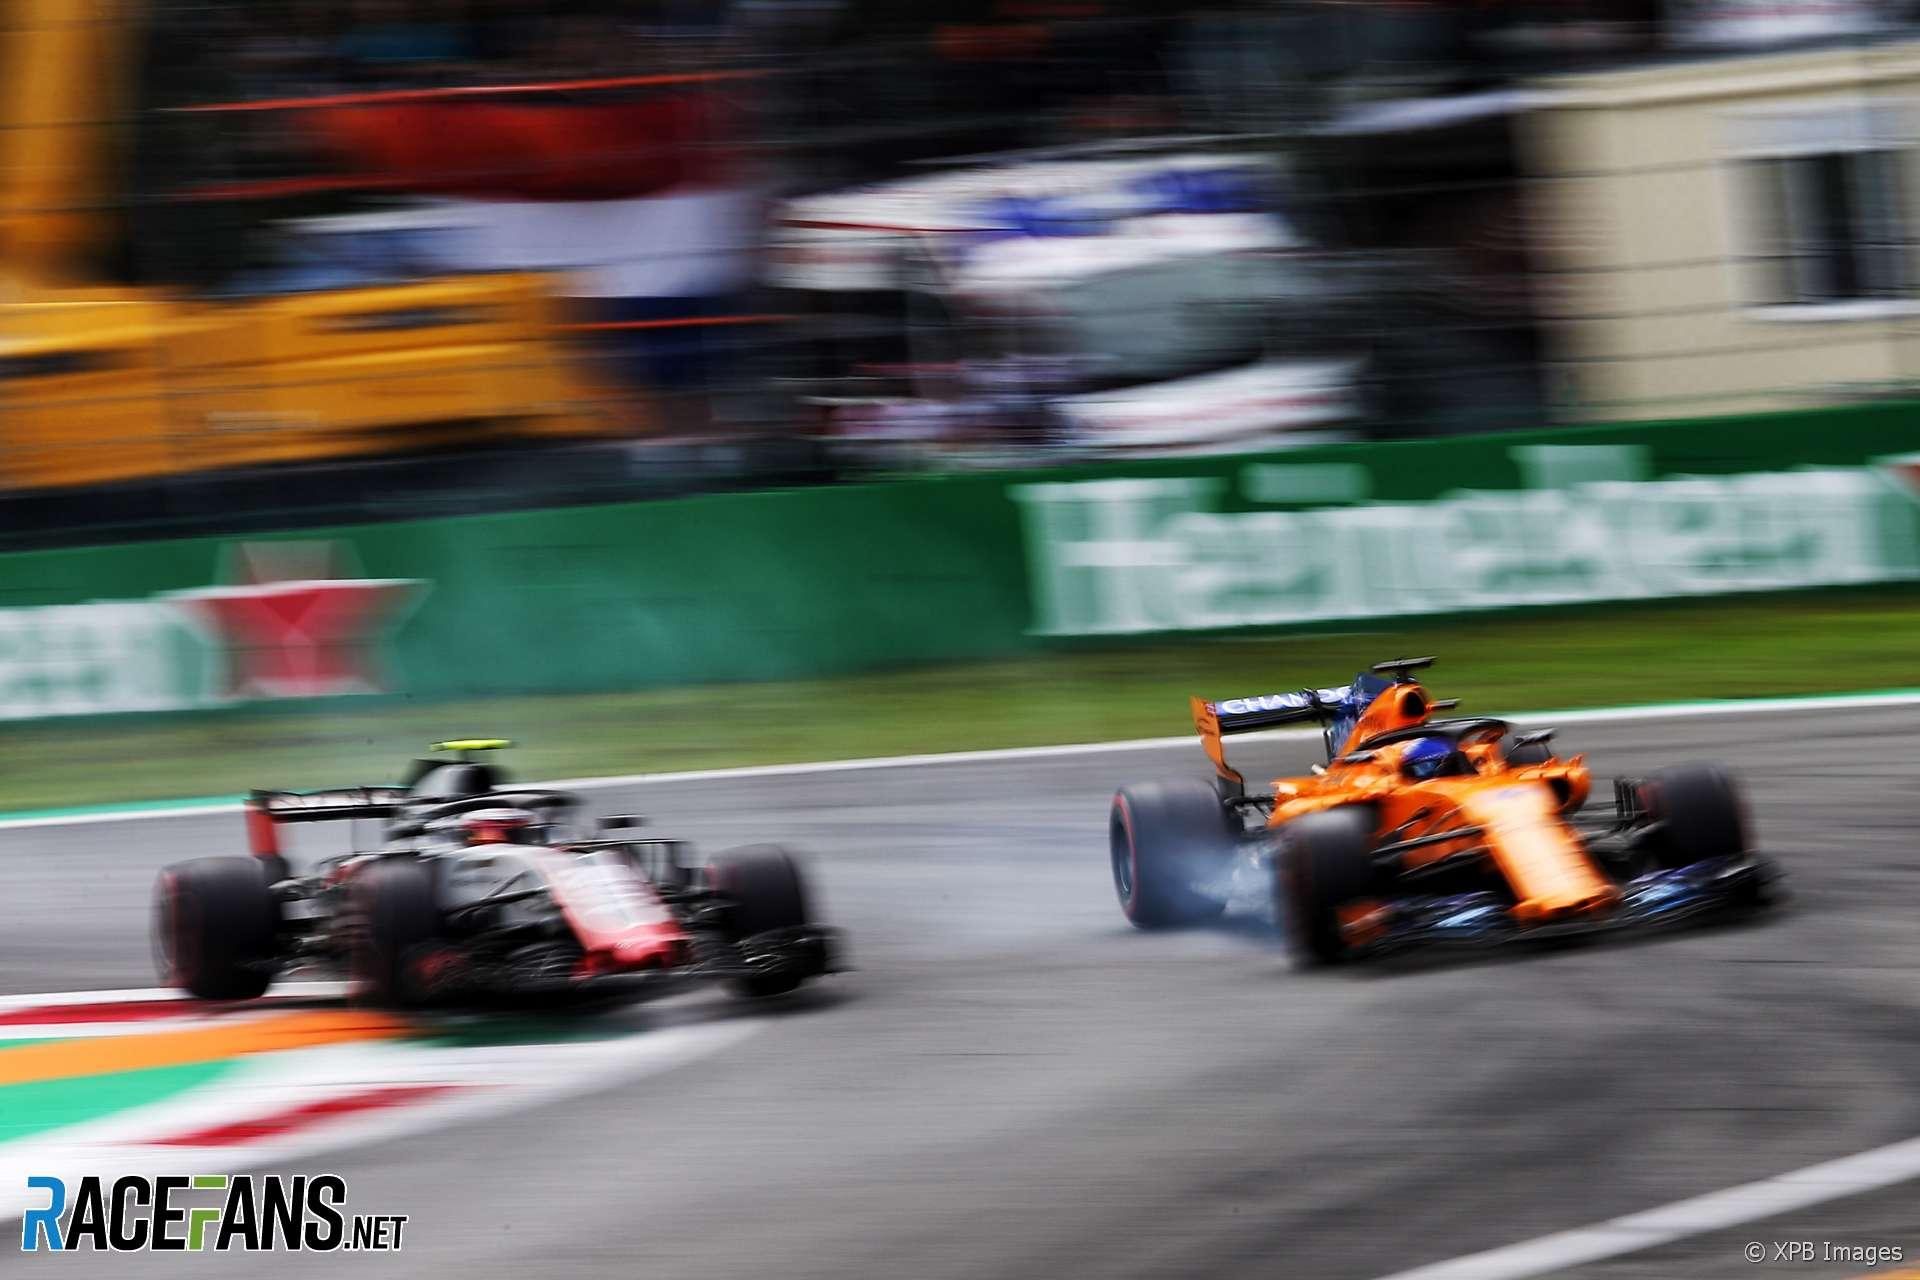 Kevin Magnussen, Fernando Alonso, Monza, 2018